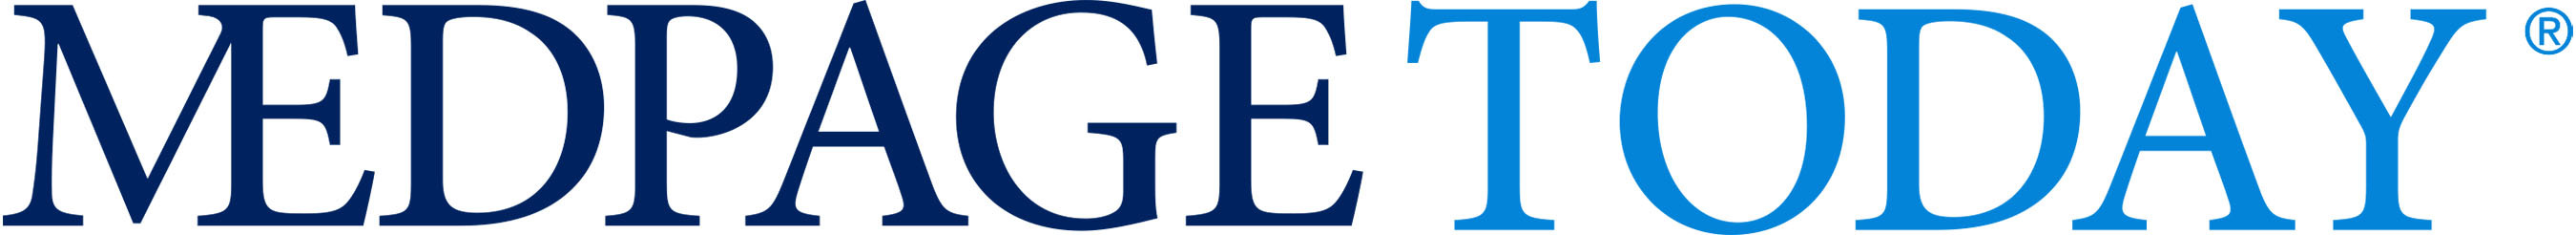 MedPage logo. (PRNewsFoto/Everyday Health, Inc.) (PRNewsFoto/)